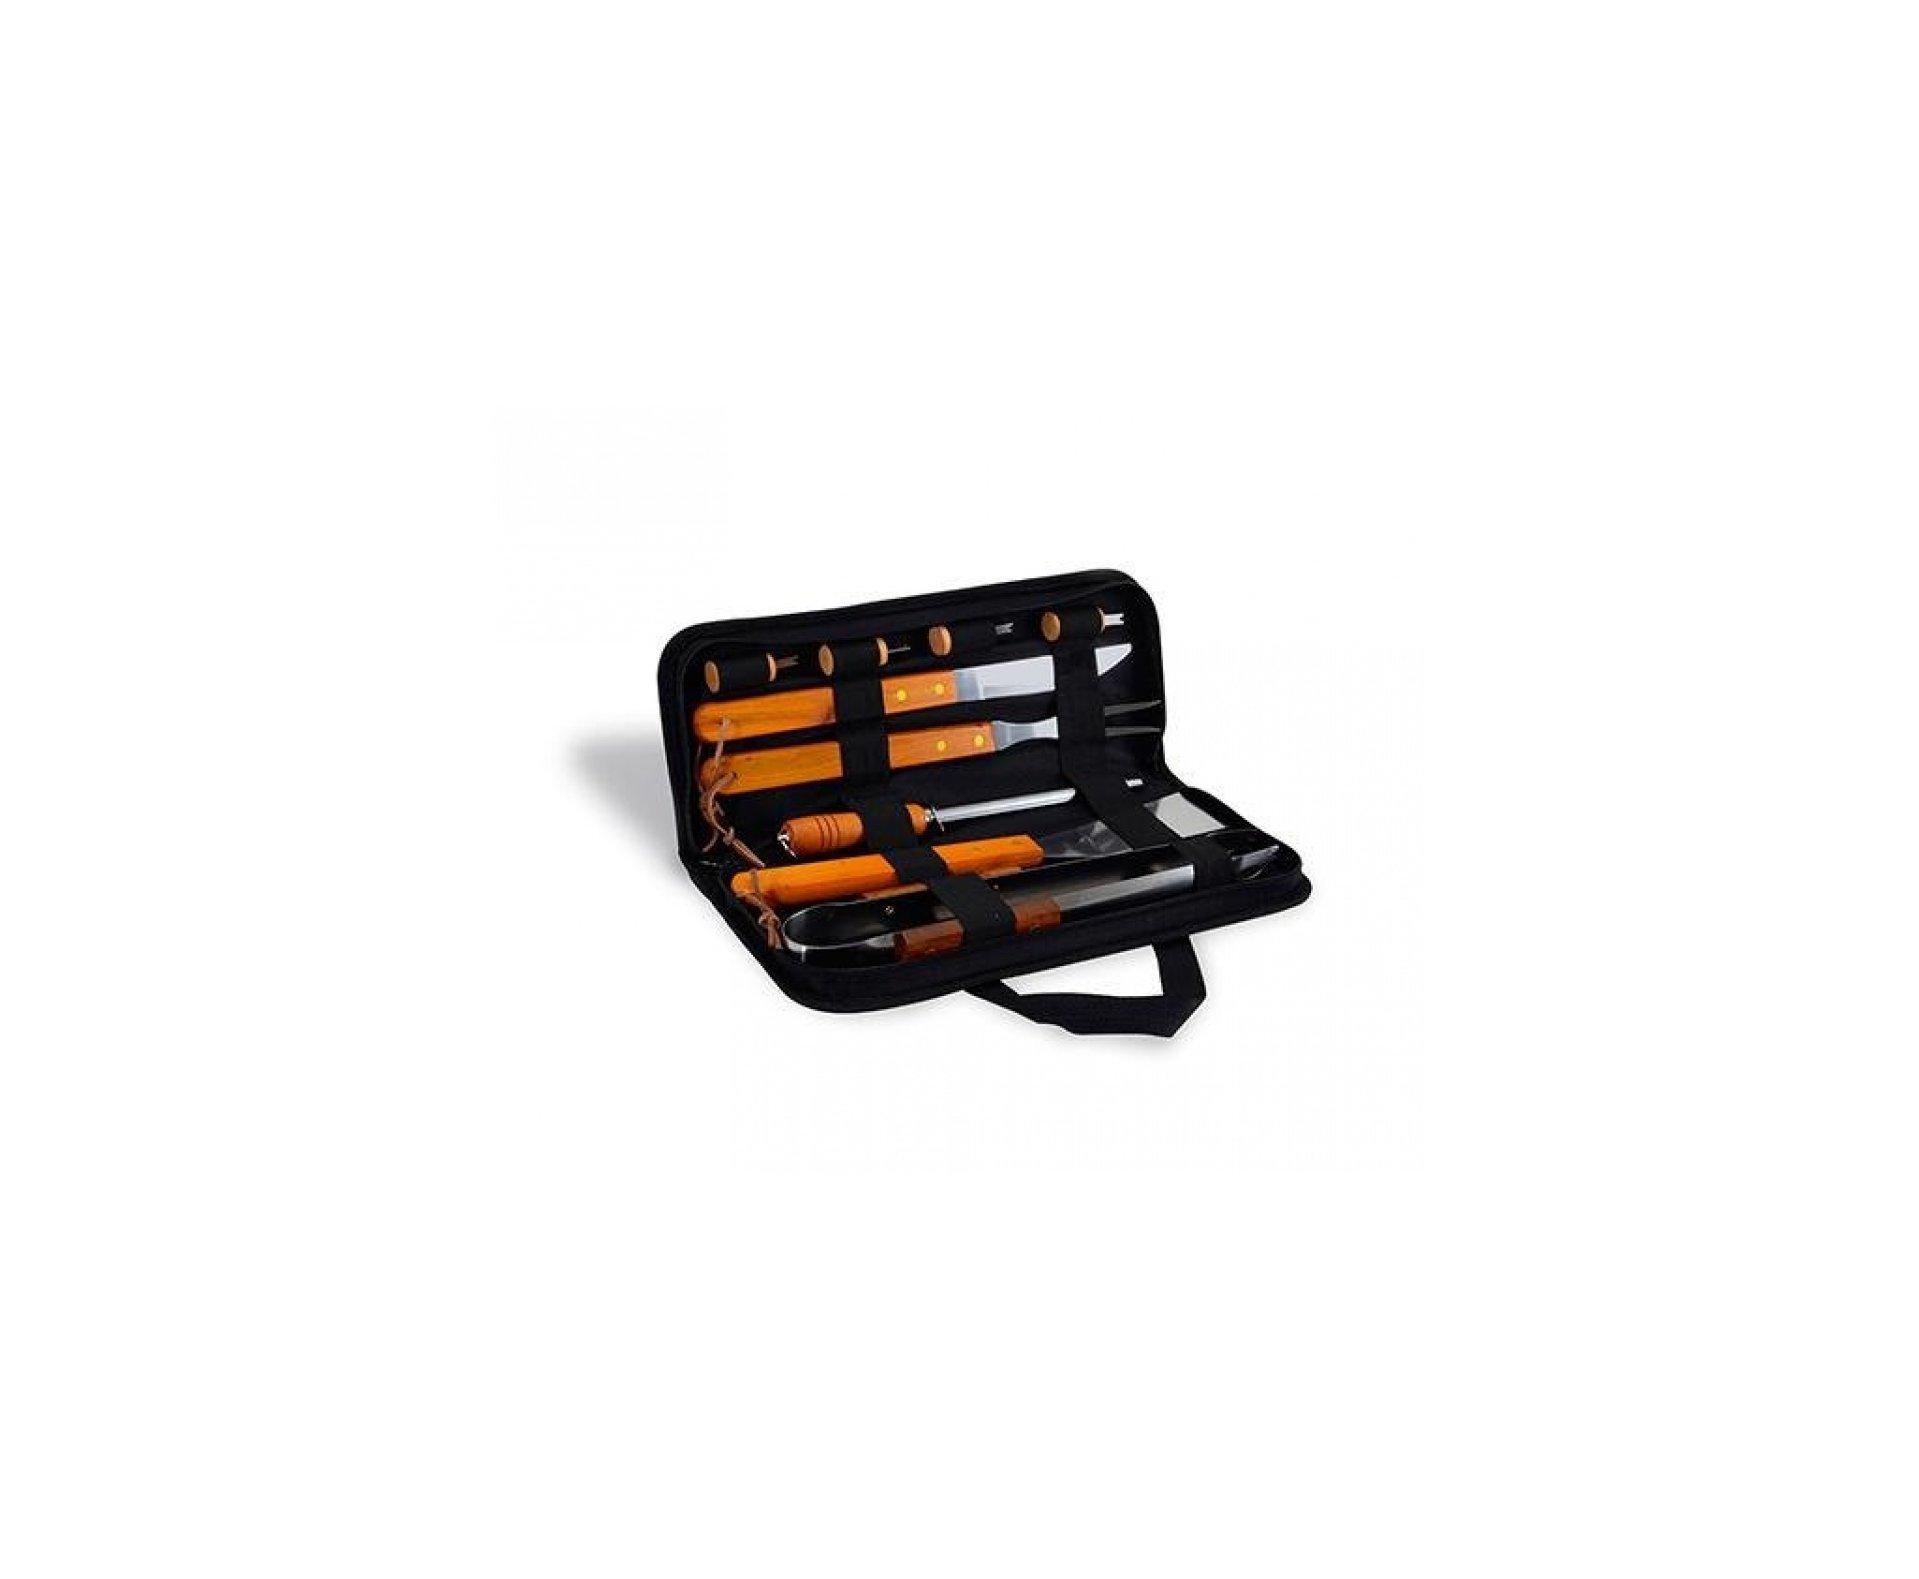 Carabina De Pressão Shadow Black Cal 5.5mm + Kit Churrasco 10 Peças Fixxar